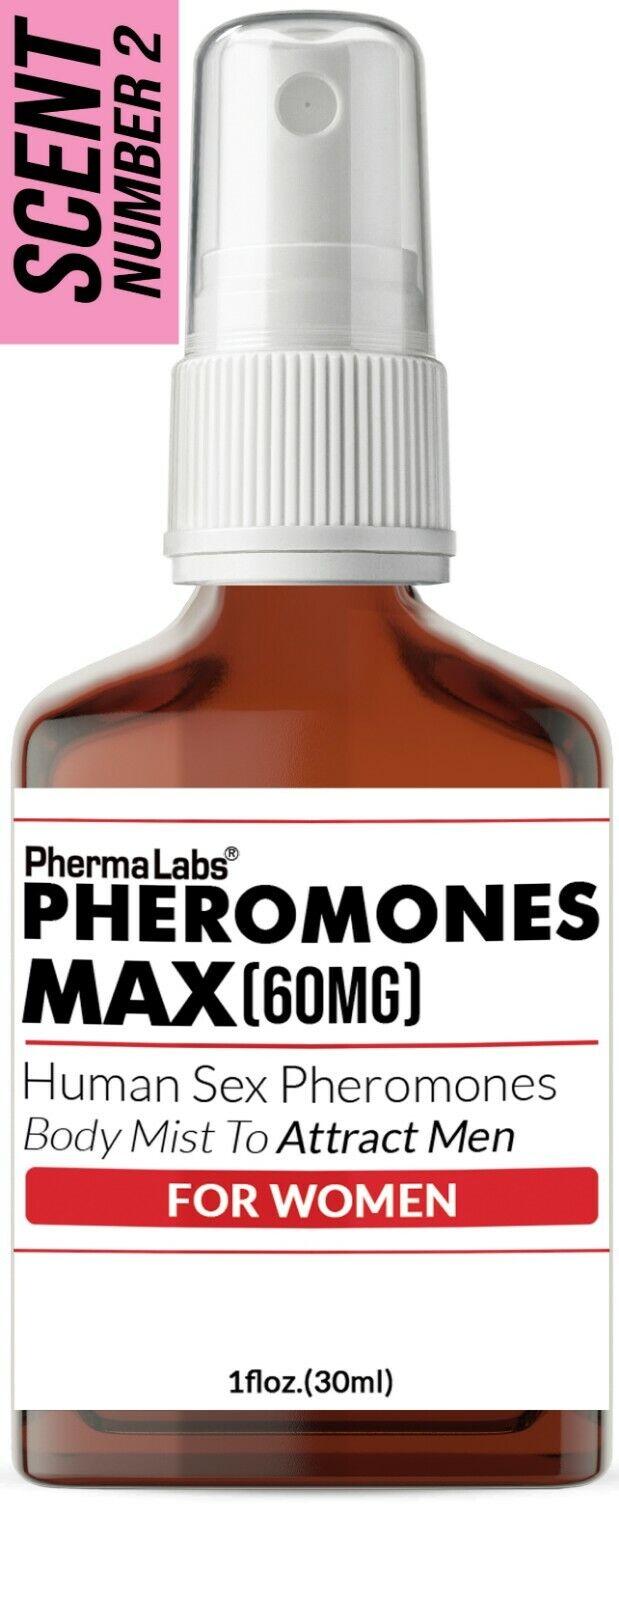 body mist instantly attract men pheromones max